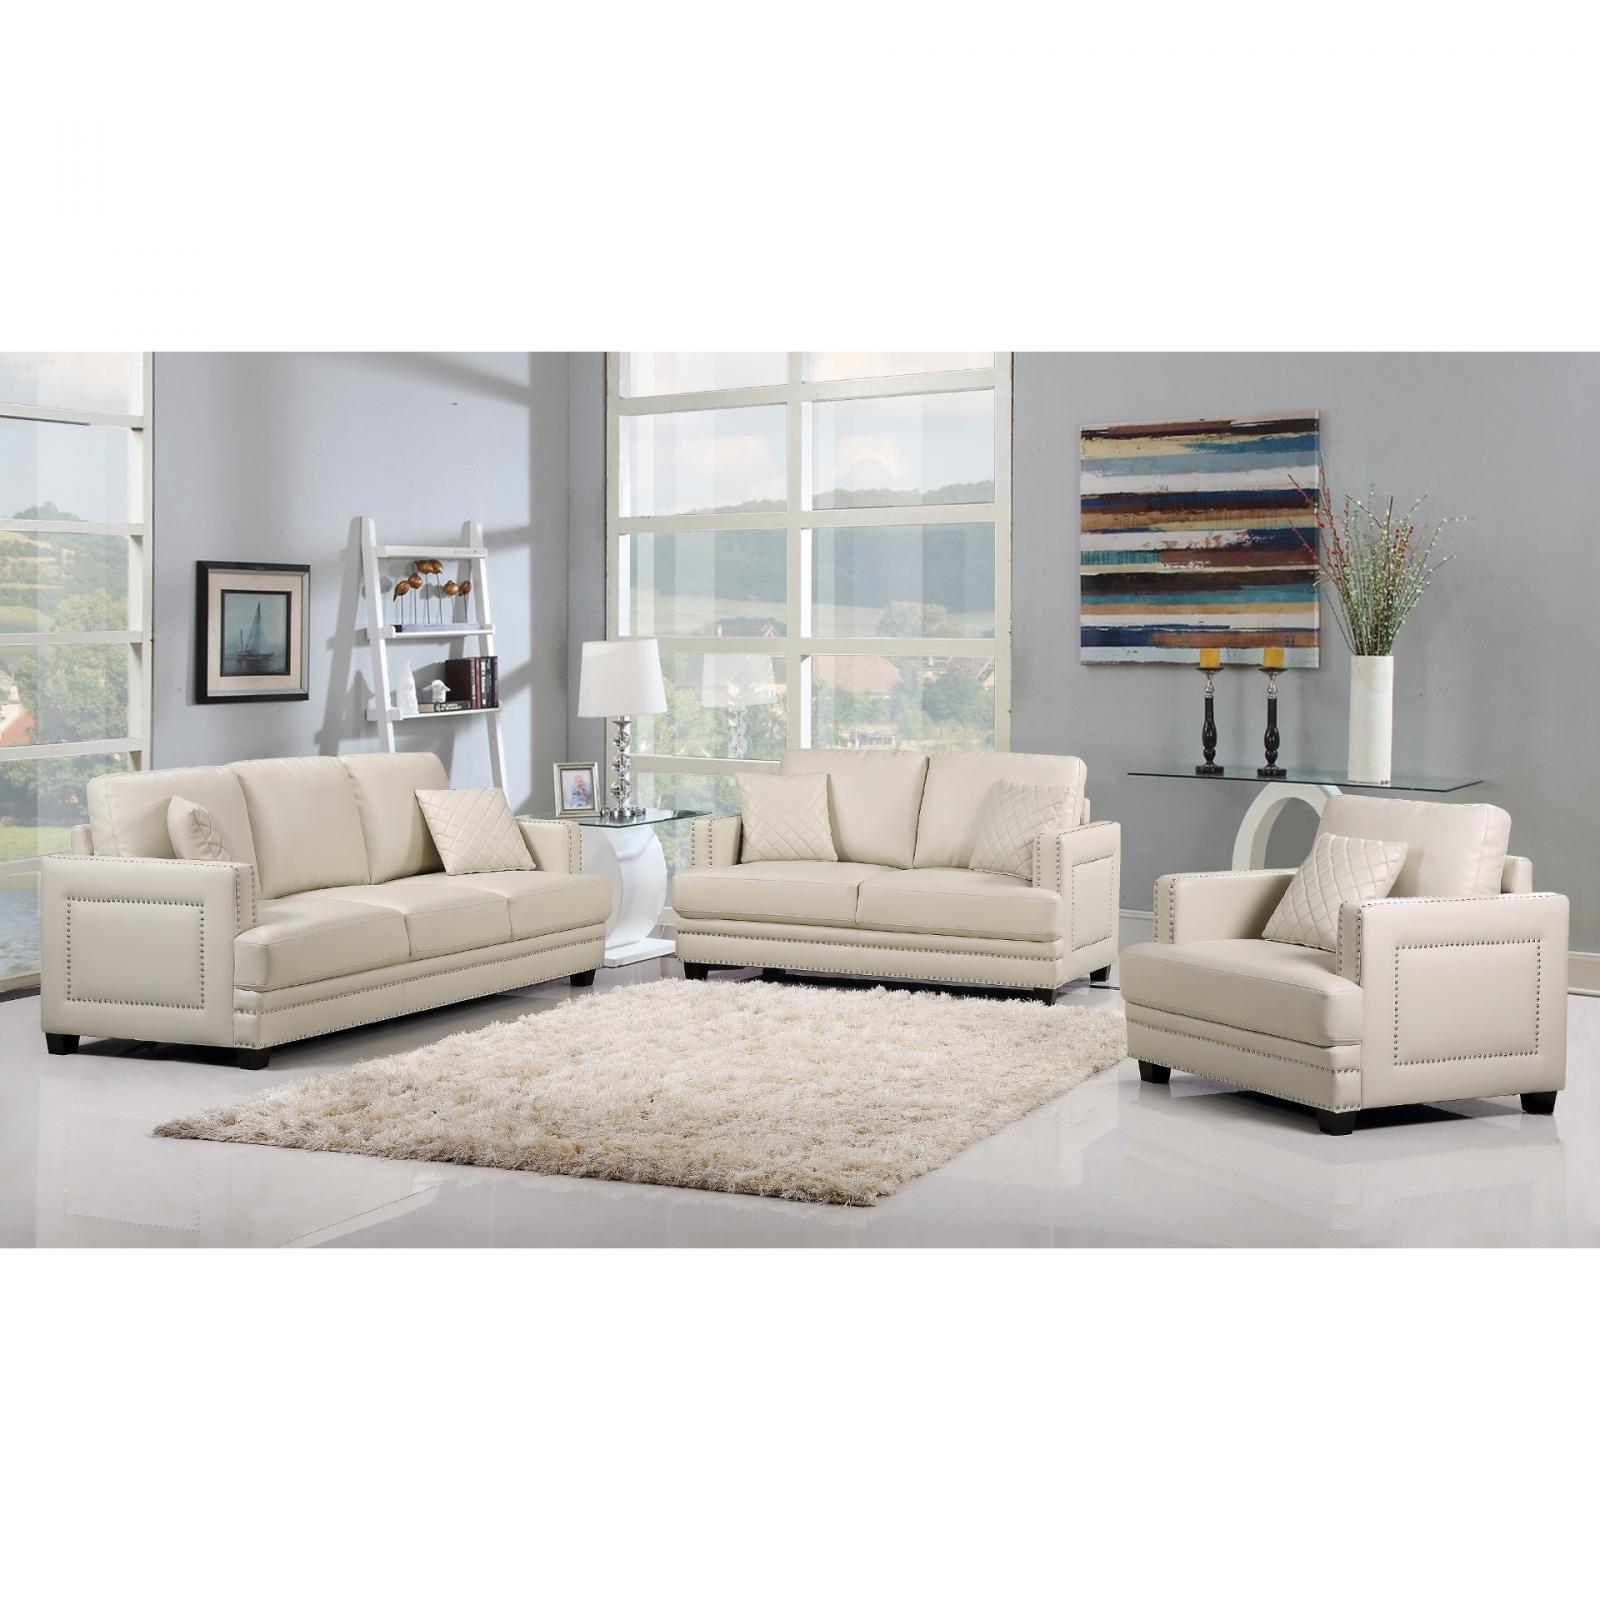 Meridian 655 Ferrara Living Room Set 3pcs in Beige Bonded Leather Contemporary